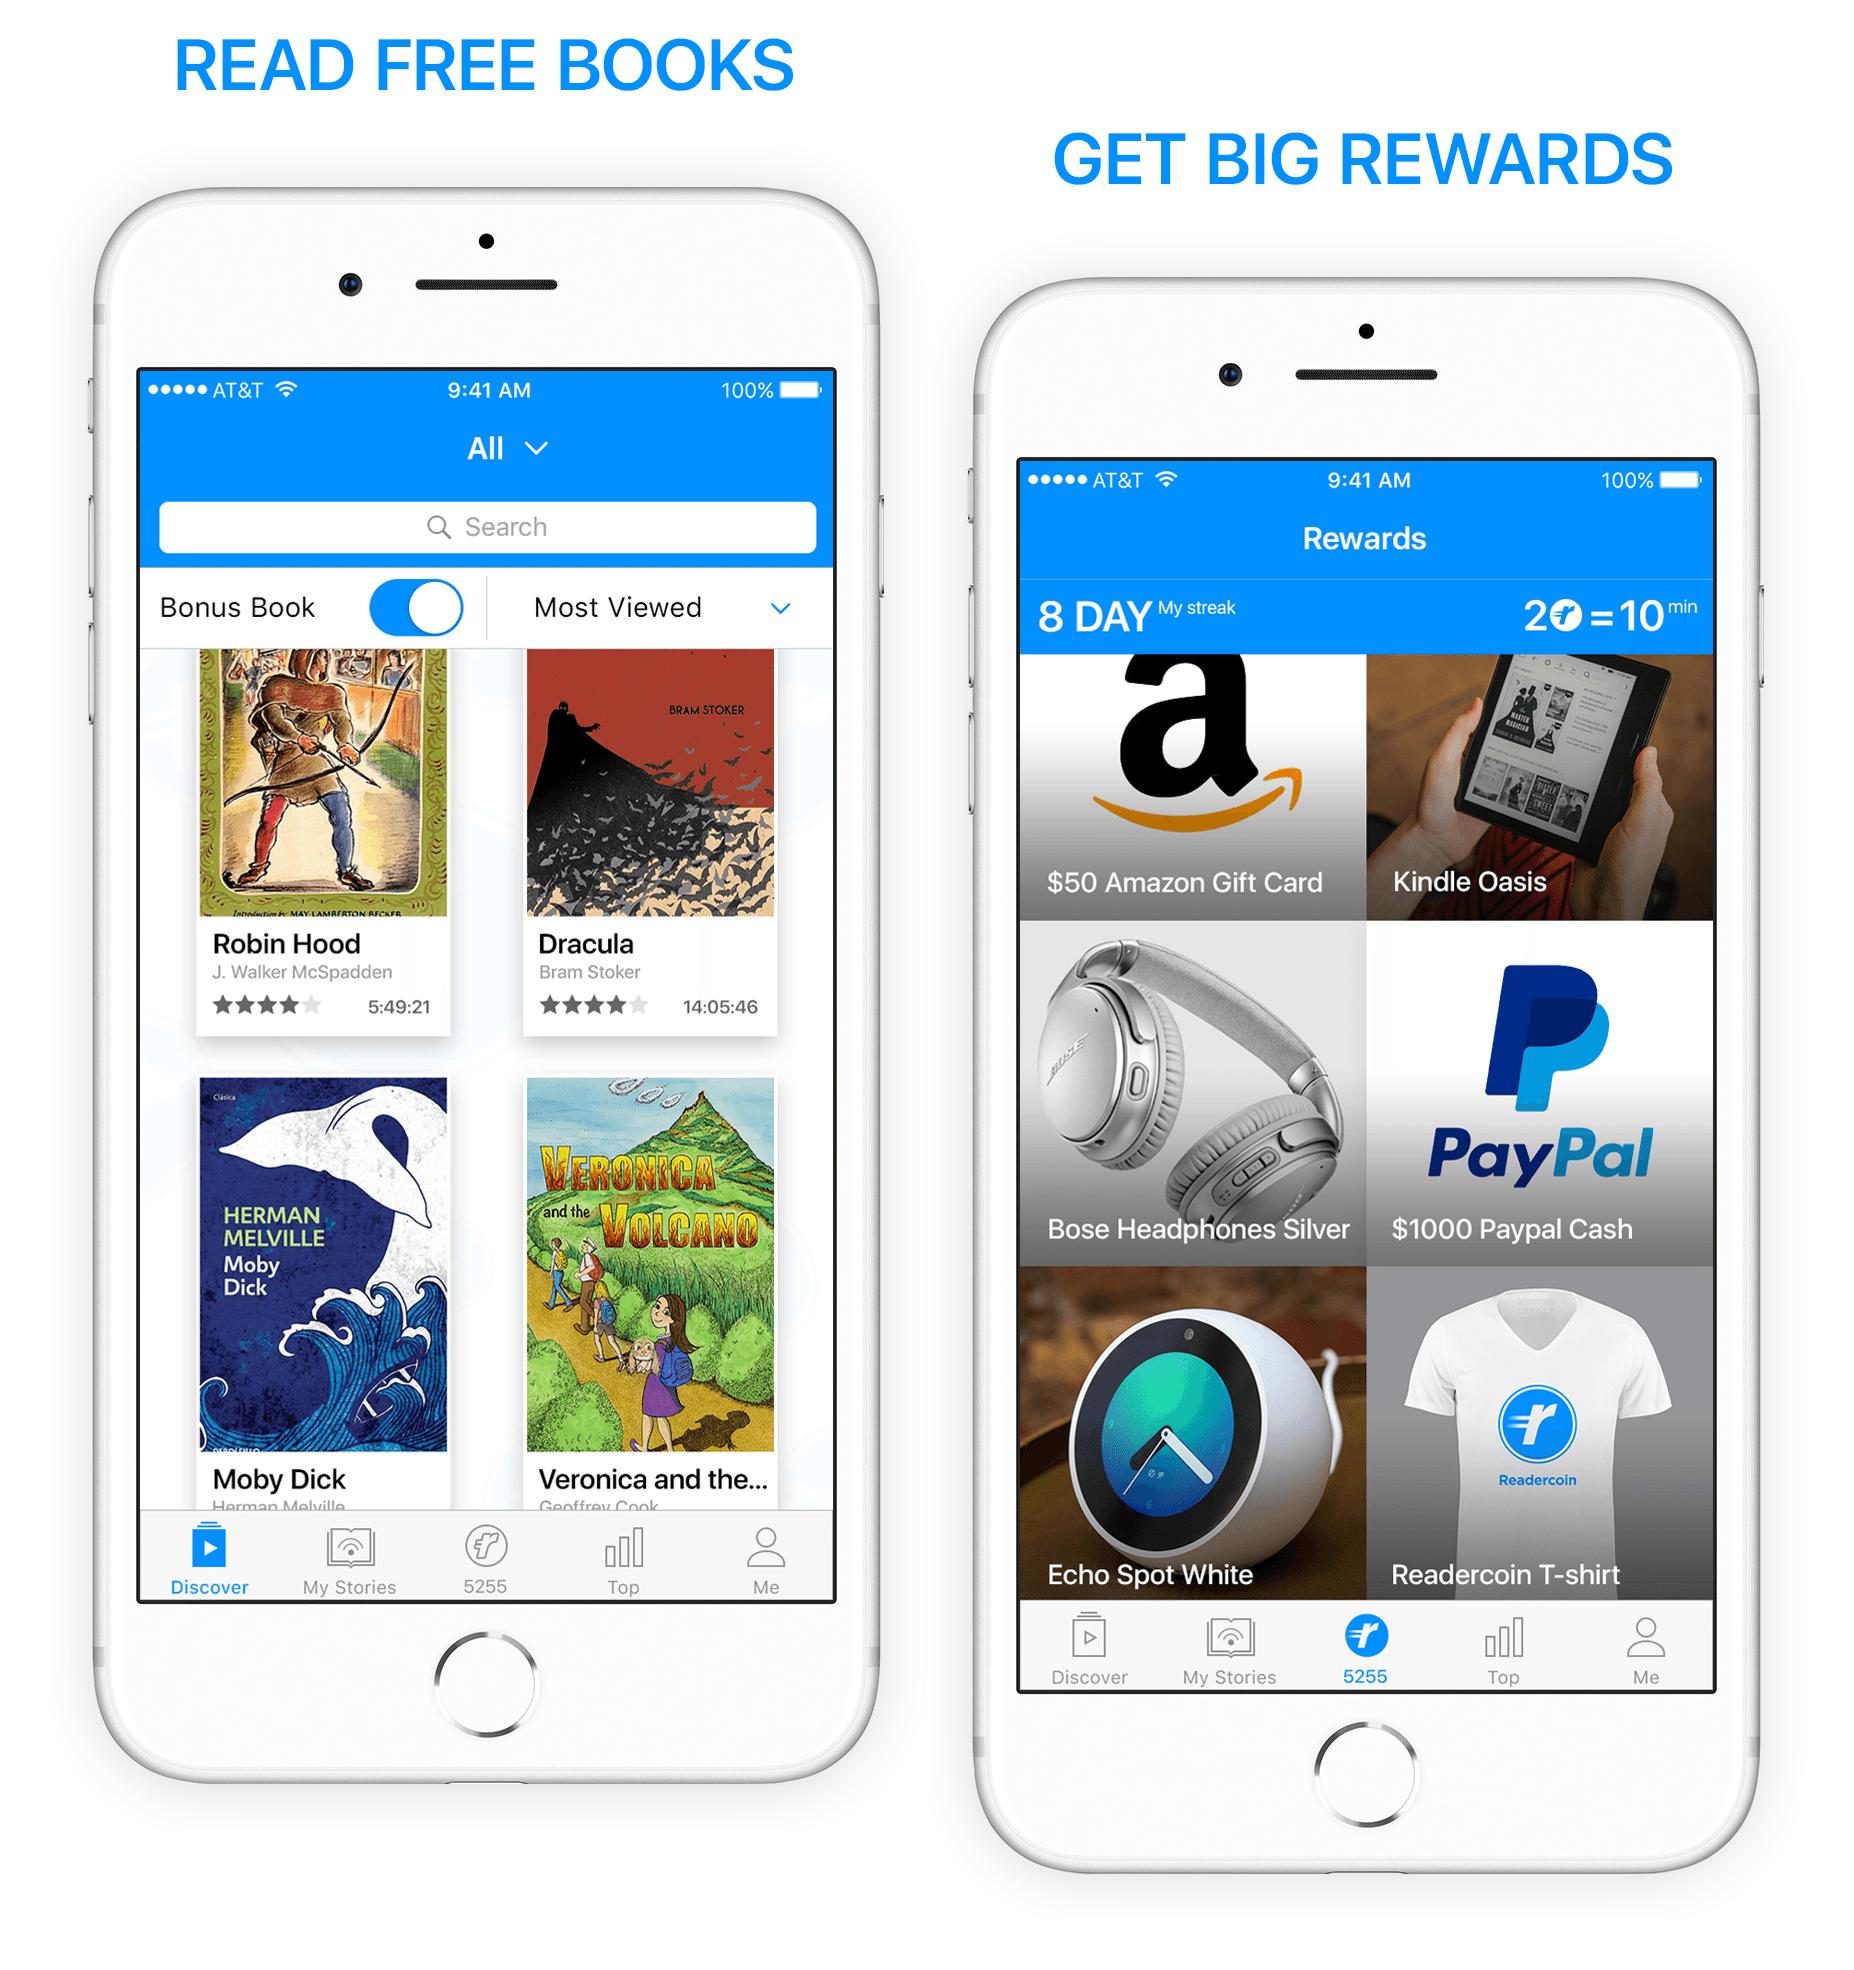 read-free-books-get-rewards.png